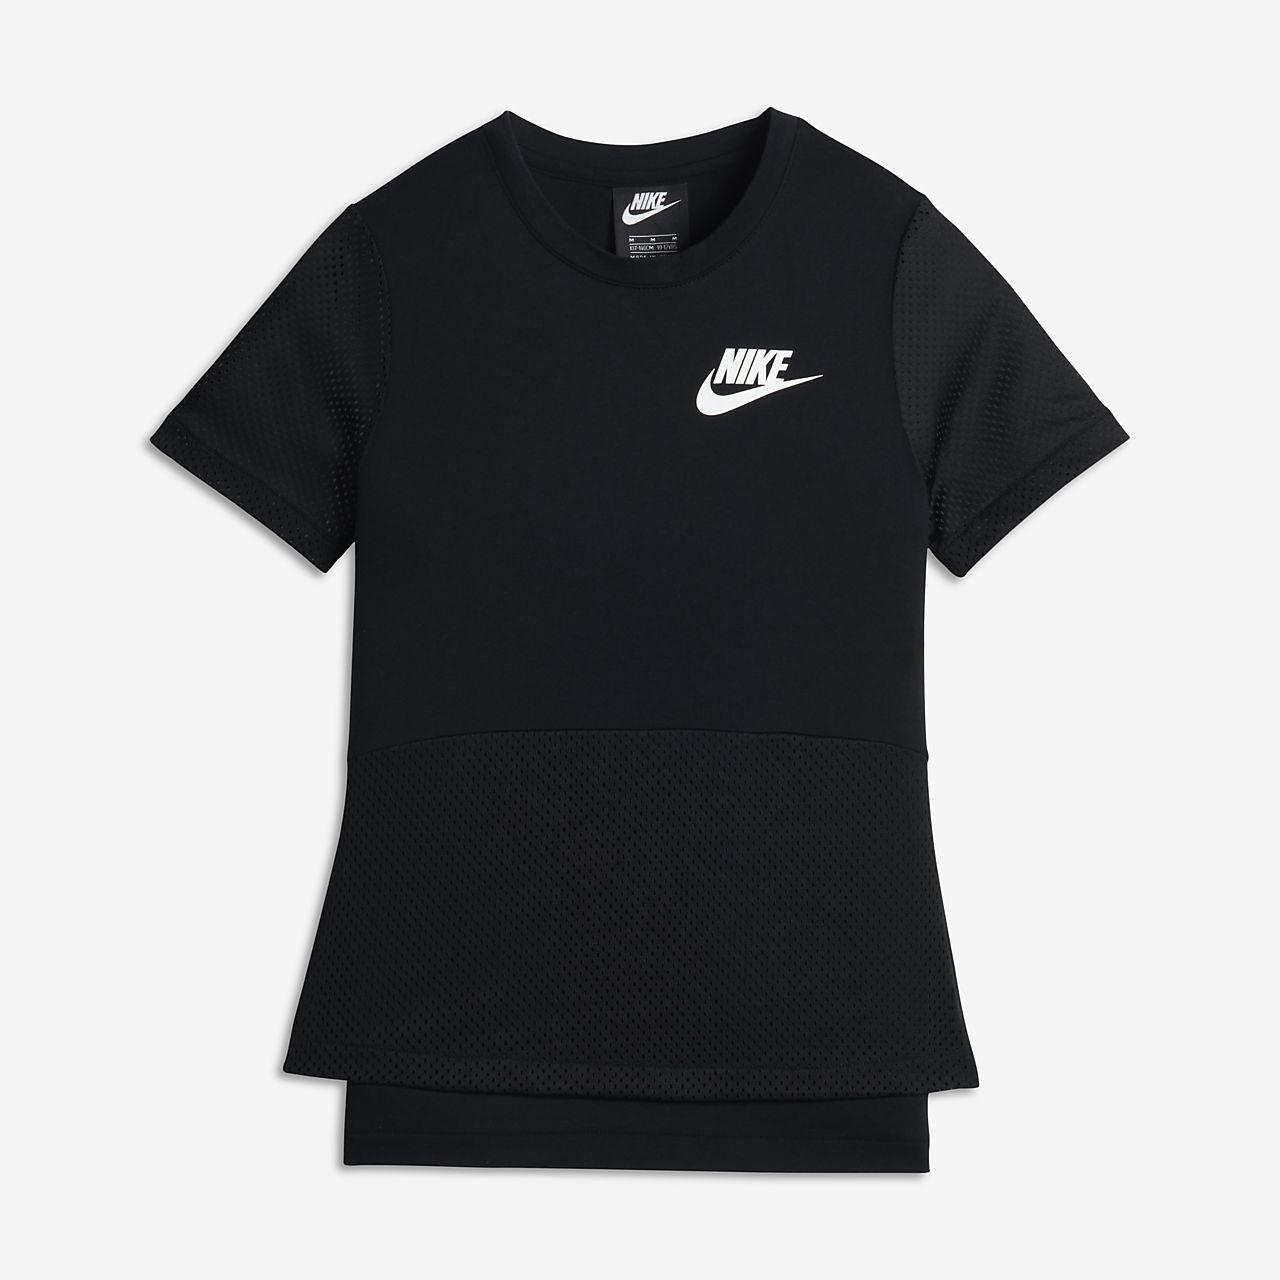 c0421adf057e Nike Sportswear Older Kids  (Girls ) Short-Sleeve Top. Nike.com GB